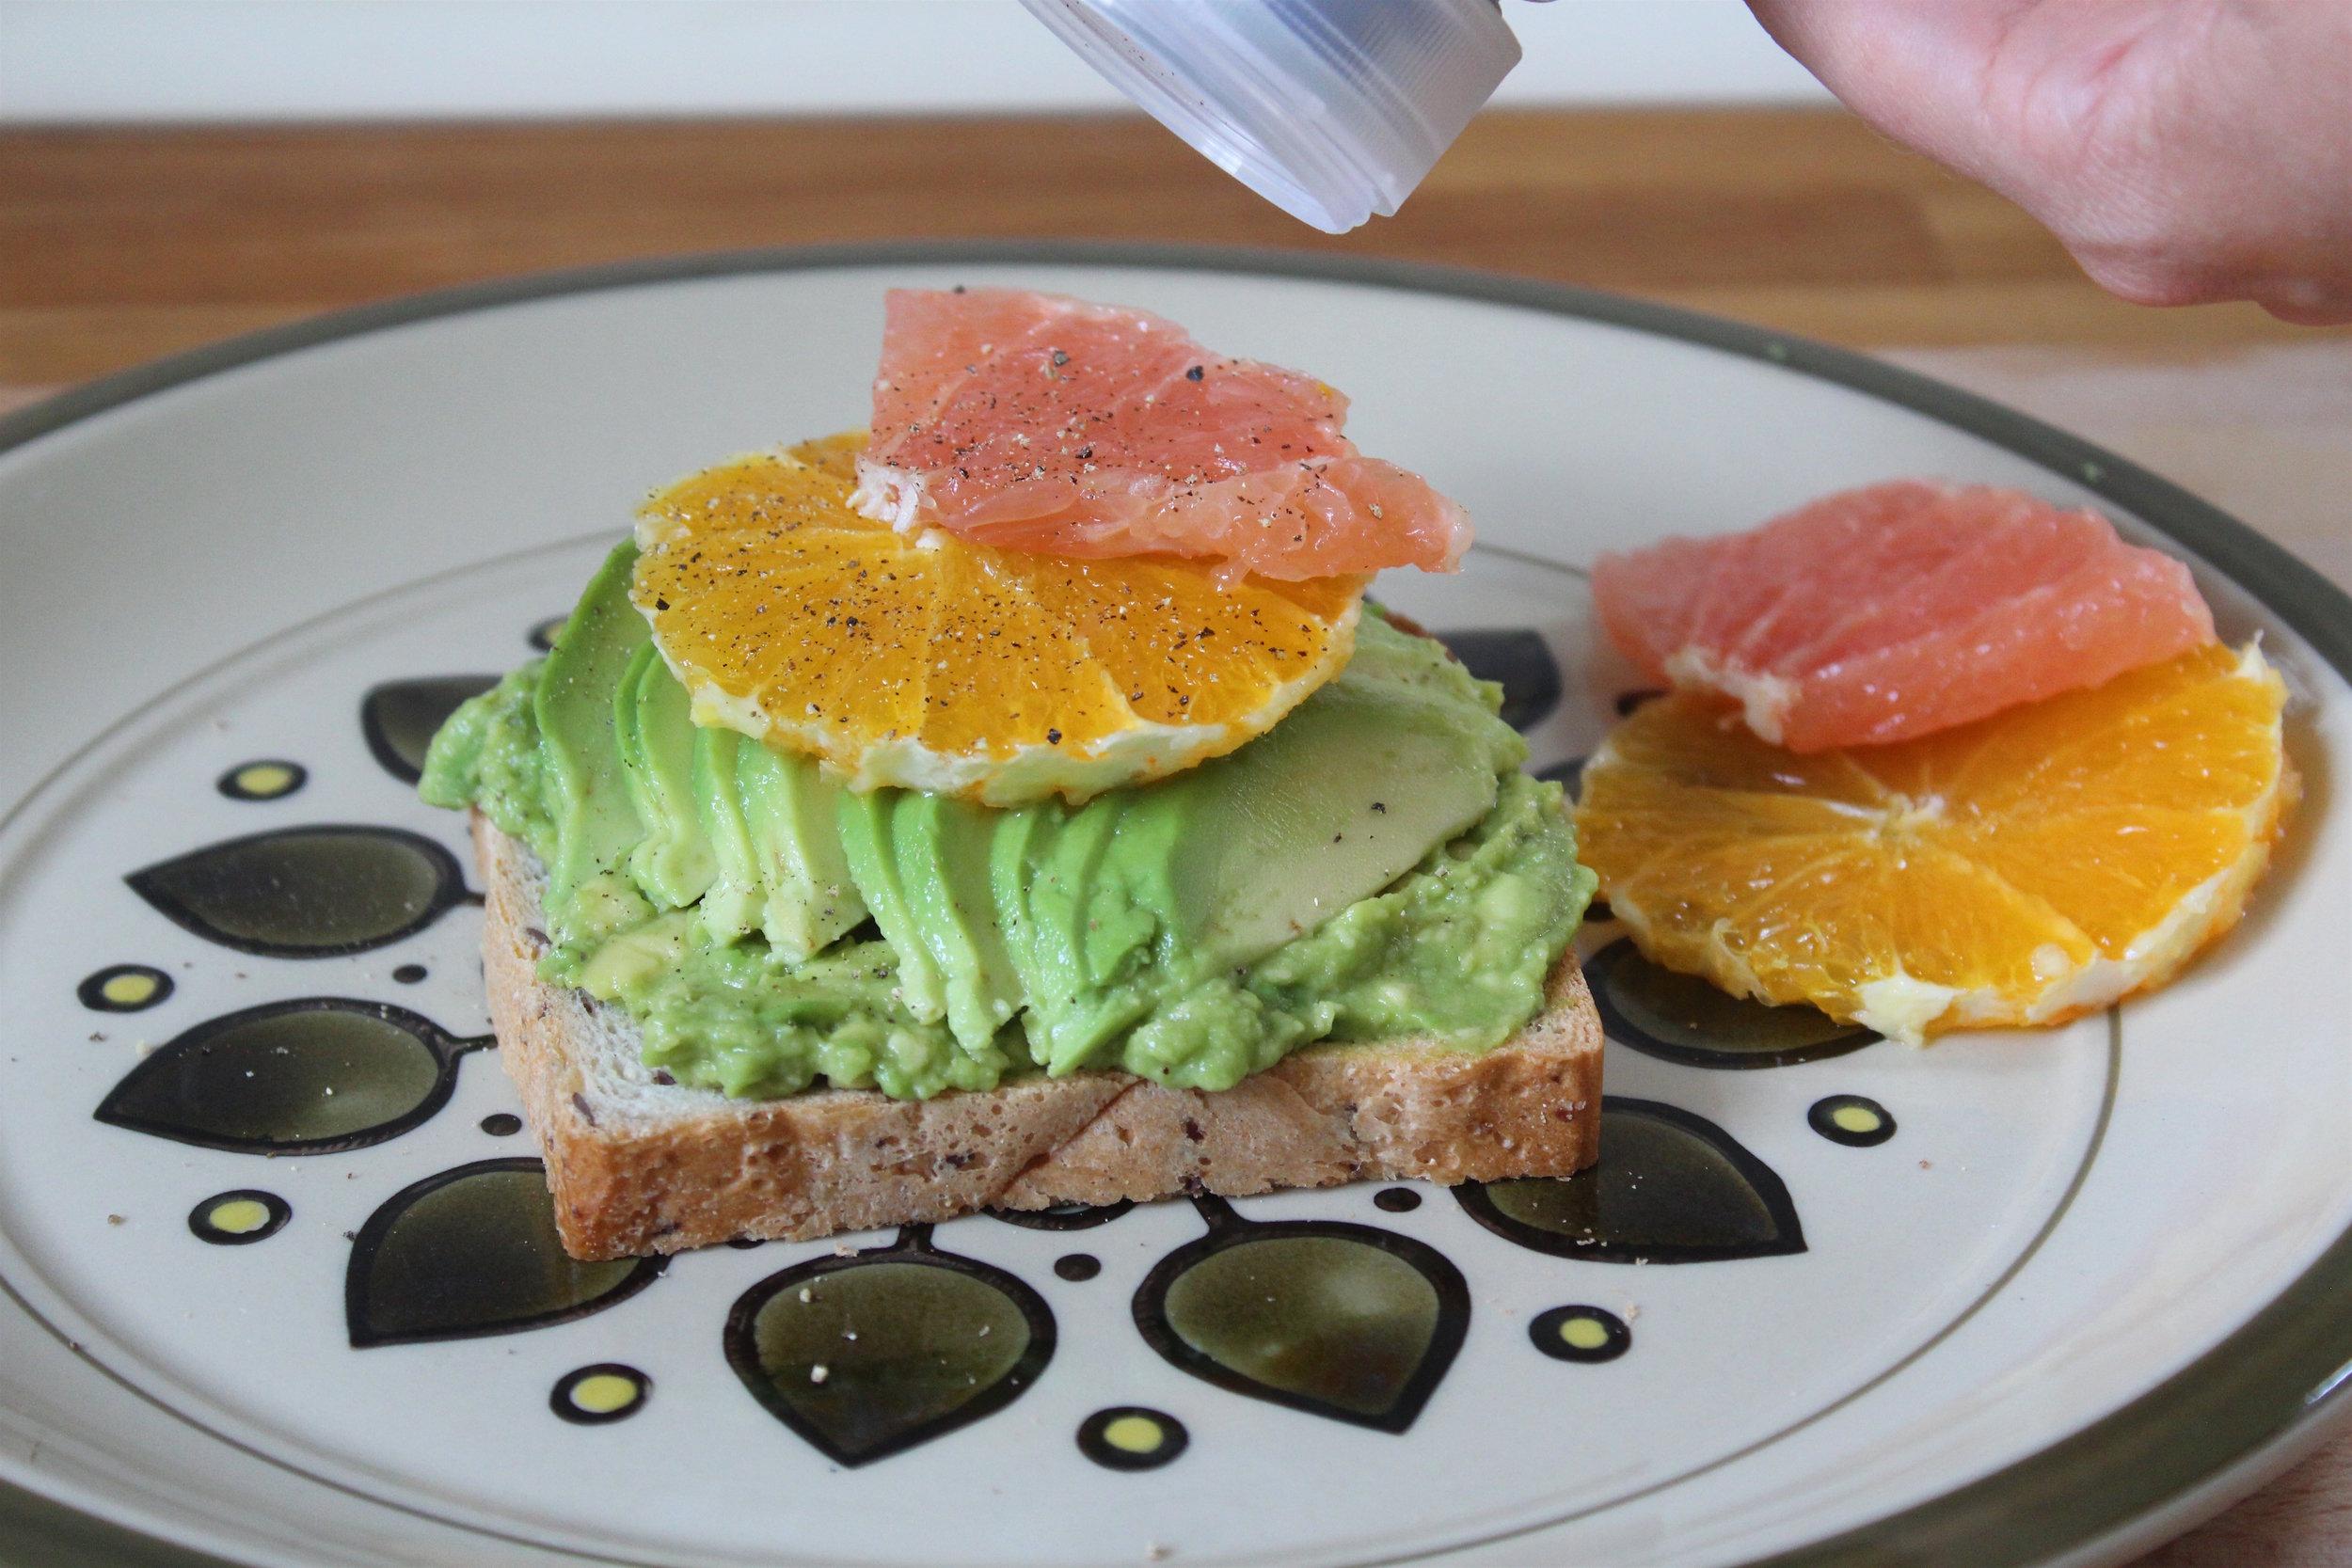 Babe Crafted_Rollin Oats_Brunch Recipe_Citrus Avocado Toast_8.jpg